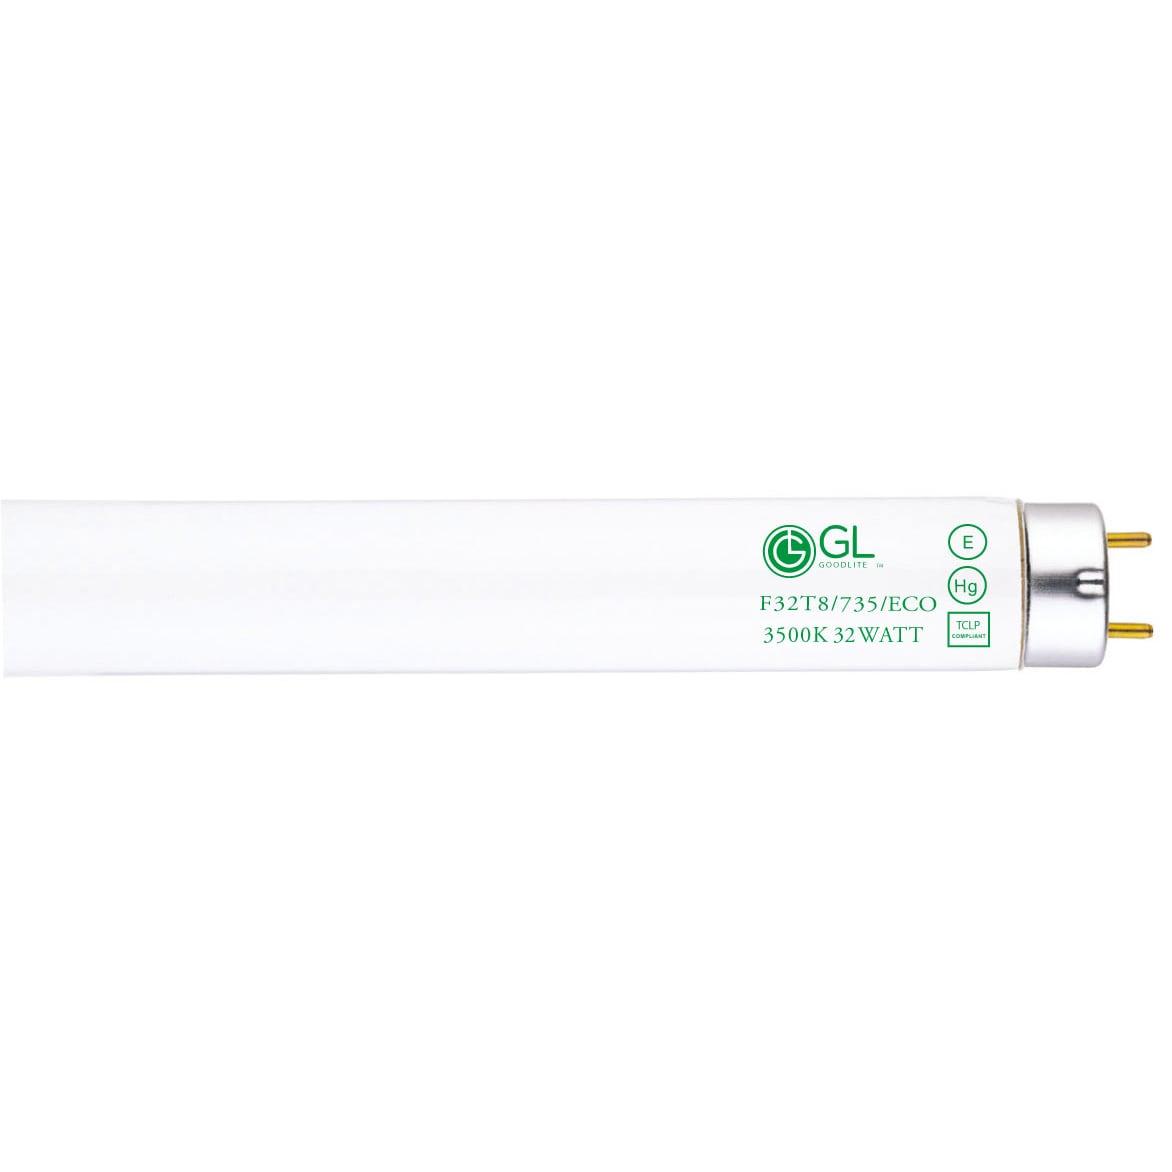 32W 48In Qty 12 T8 Fluorescent Lamp Pack of 12 Min L 6500K